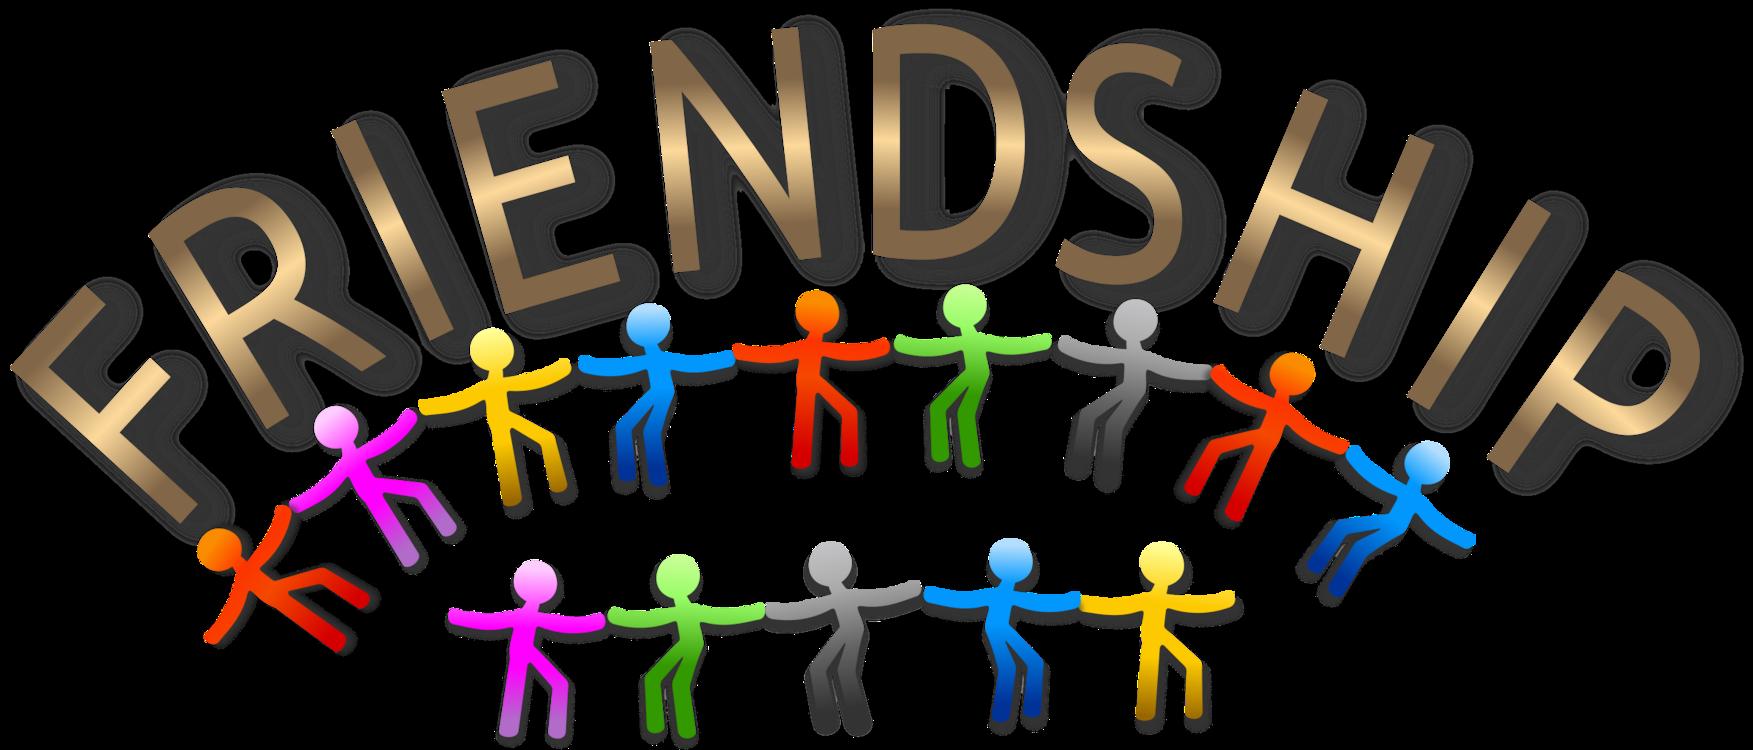 Human behavior area text. Friendship clipart friendship symbol